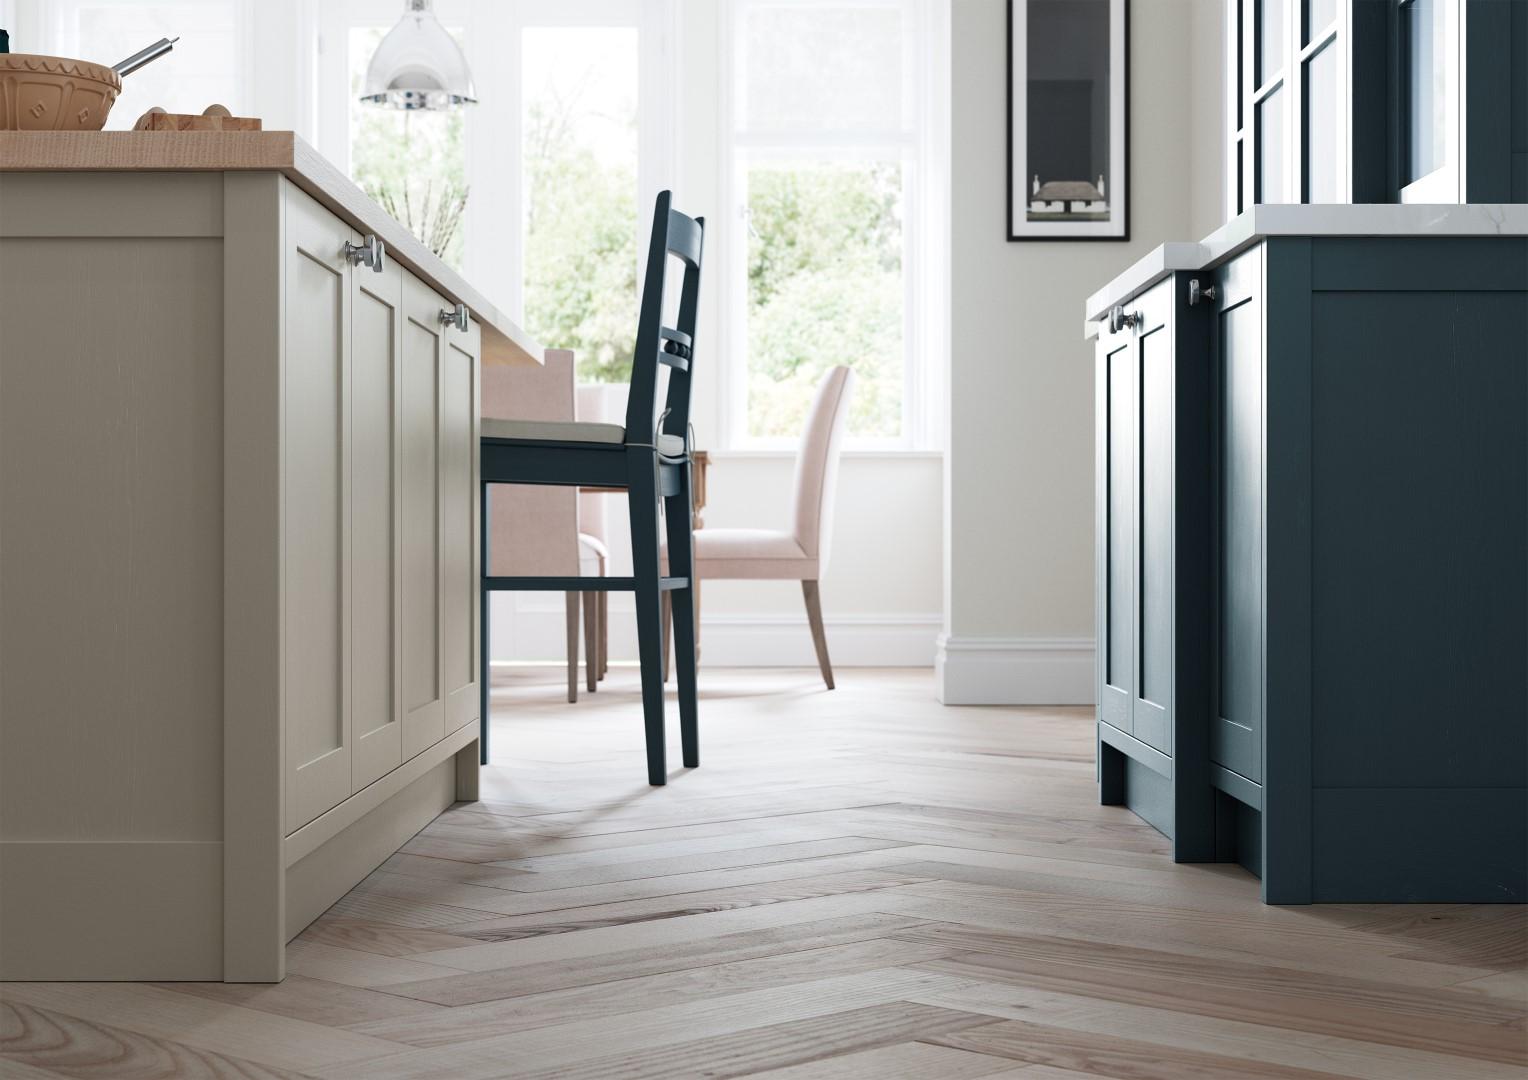 Aldana Stone and Marine - Kitchen Design - Alan Kelly Kitchens - Waterford - 6